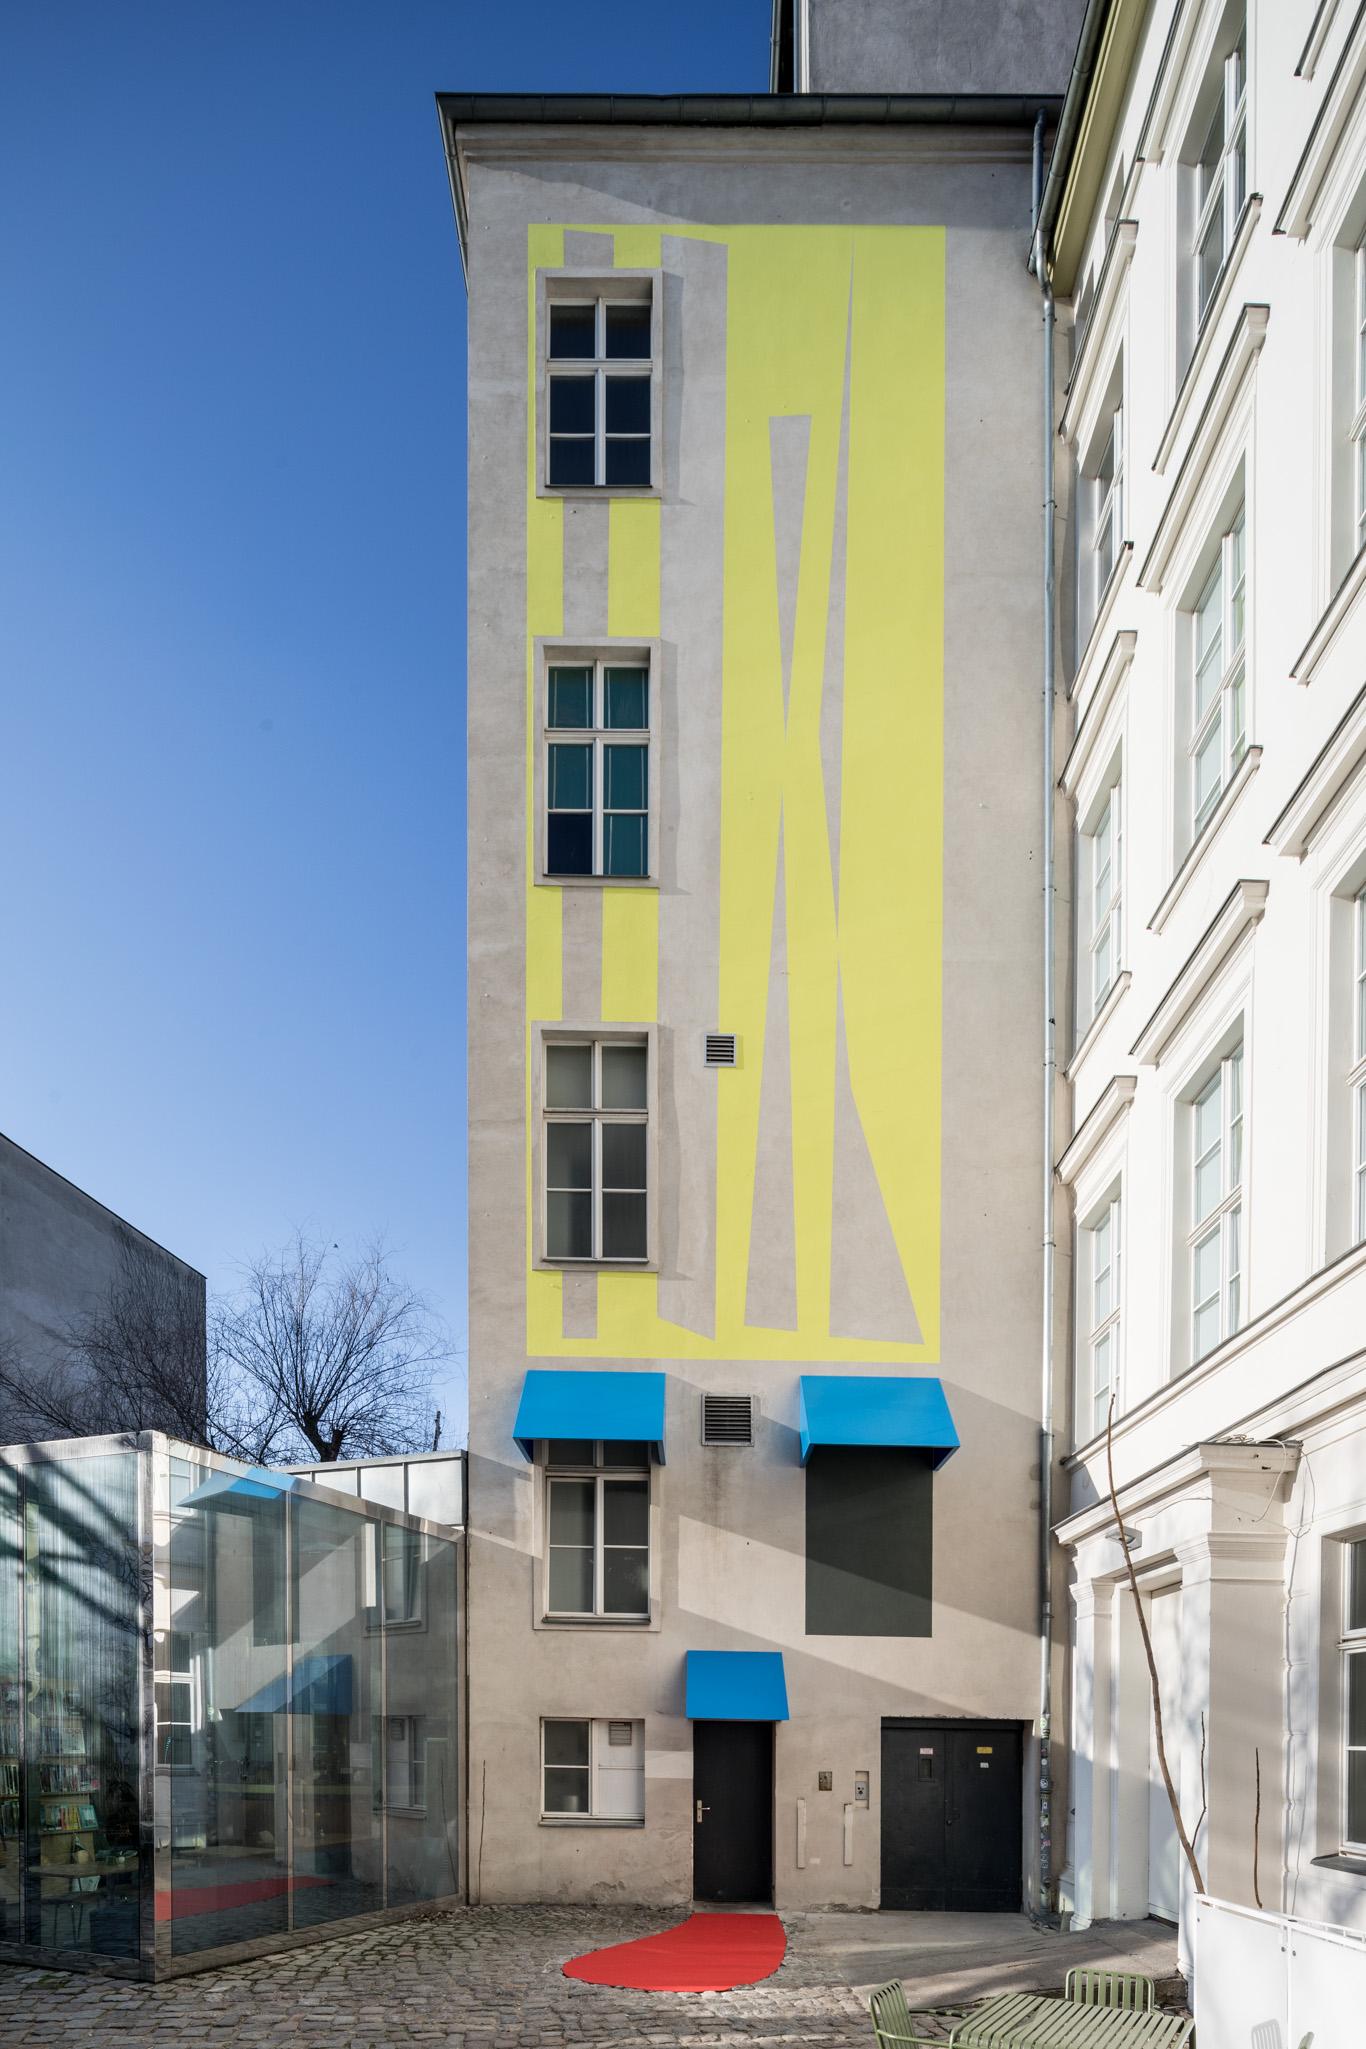 Judith Hopf, Stepping Stairs (2018), Fassadenarbeit im Innenhof der KW Institute for Contemporary Art / mural on KW's courtyard façade, Foto / photo: Frank Sperling